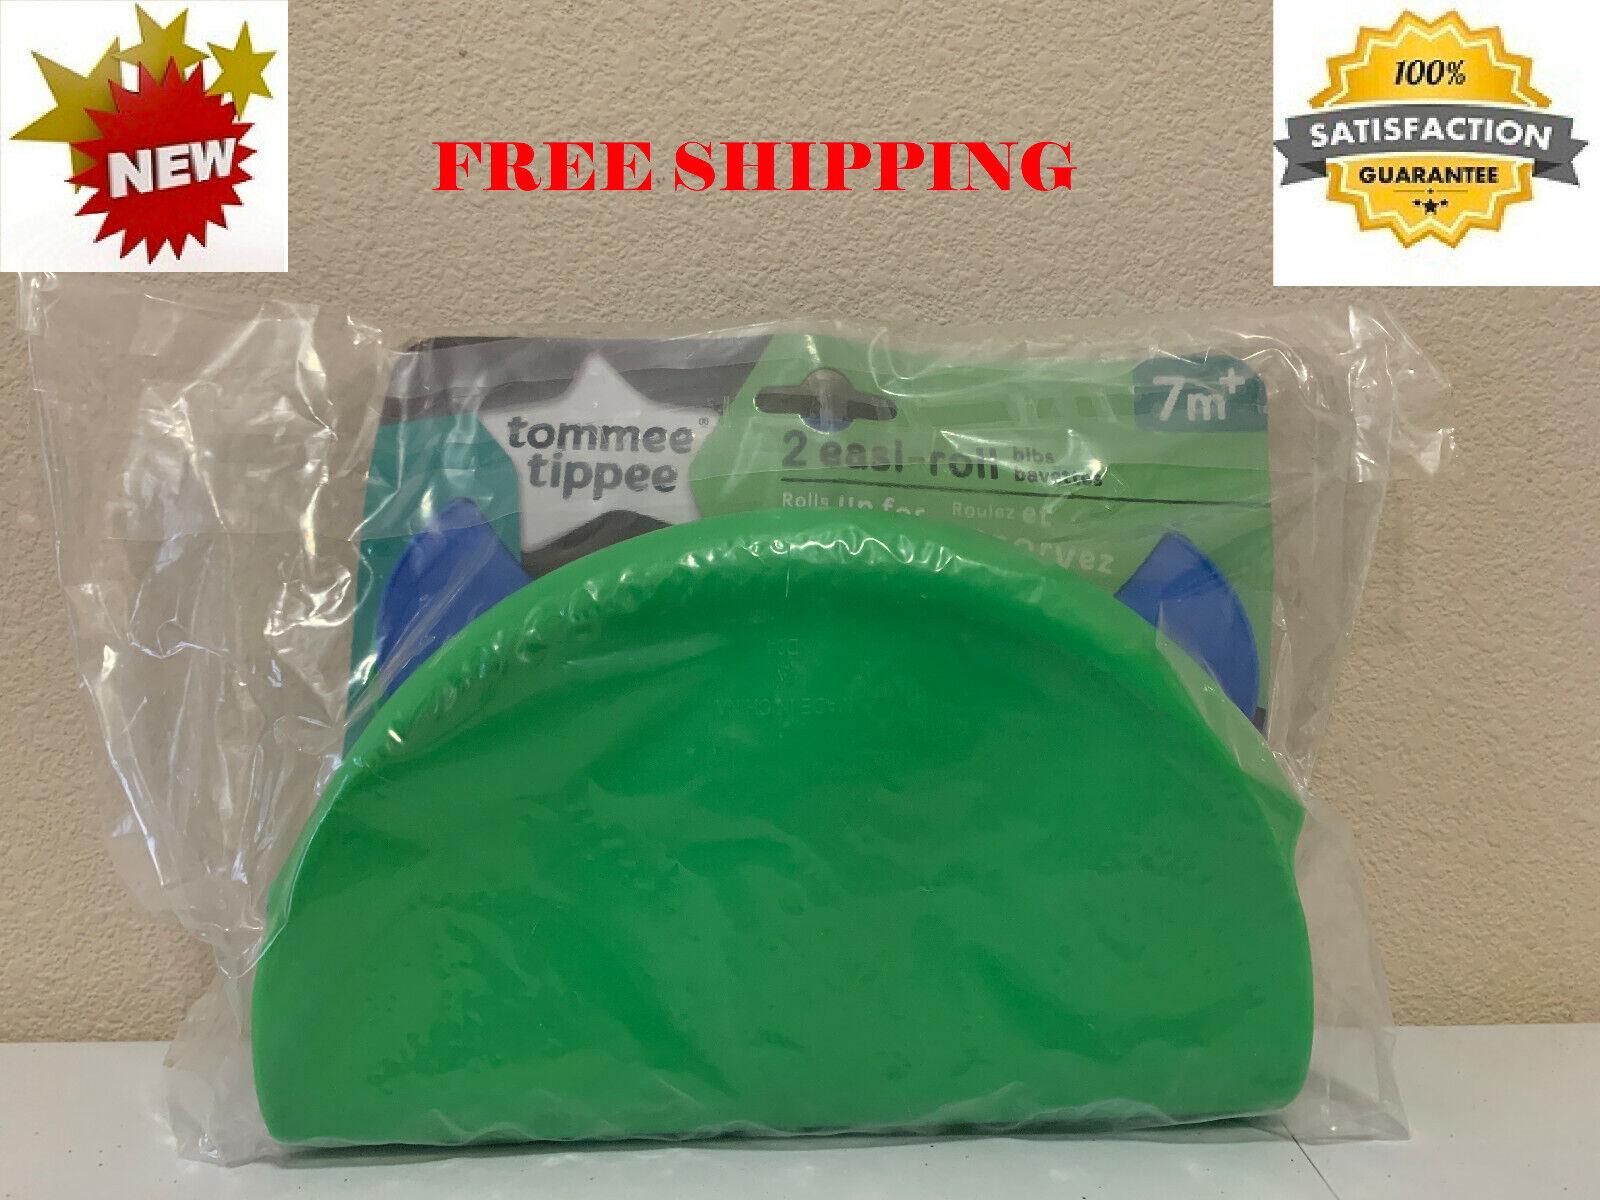 Tommee Tippee Easi-Roll Up Bib, BPA-free Crumb & Drip Catche